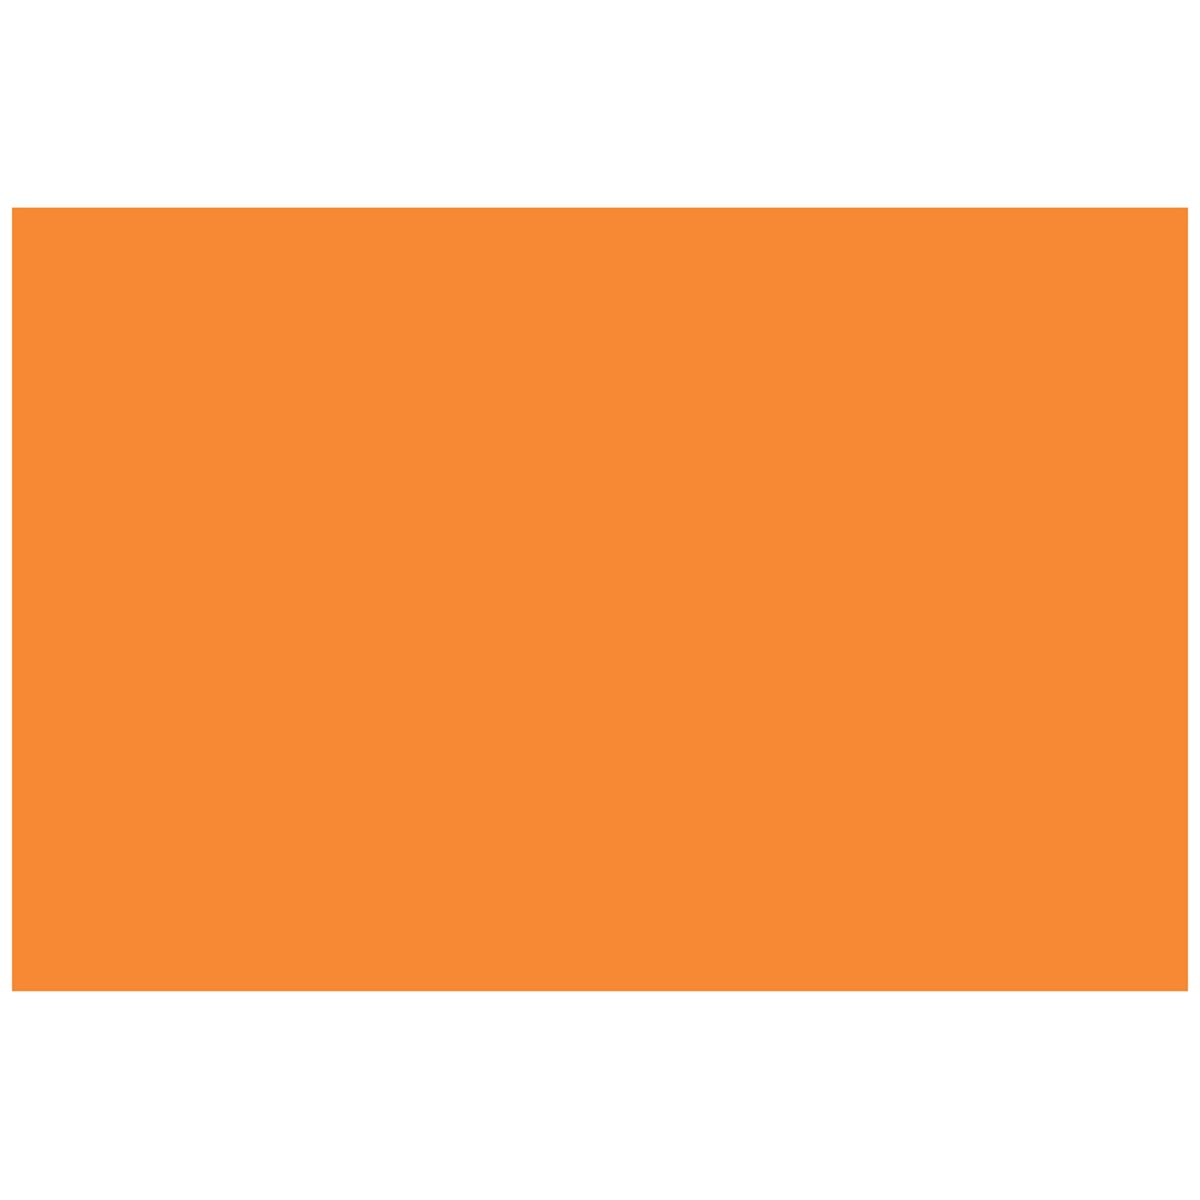 PDC Healthcare CS-O Label Compatible with CS-2 Guns Paper, Permanent, 1'' Core, 15/16'' x 5/8'', Orange (Pack of 24000)